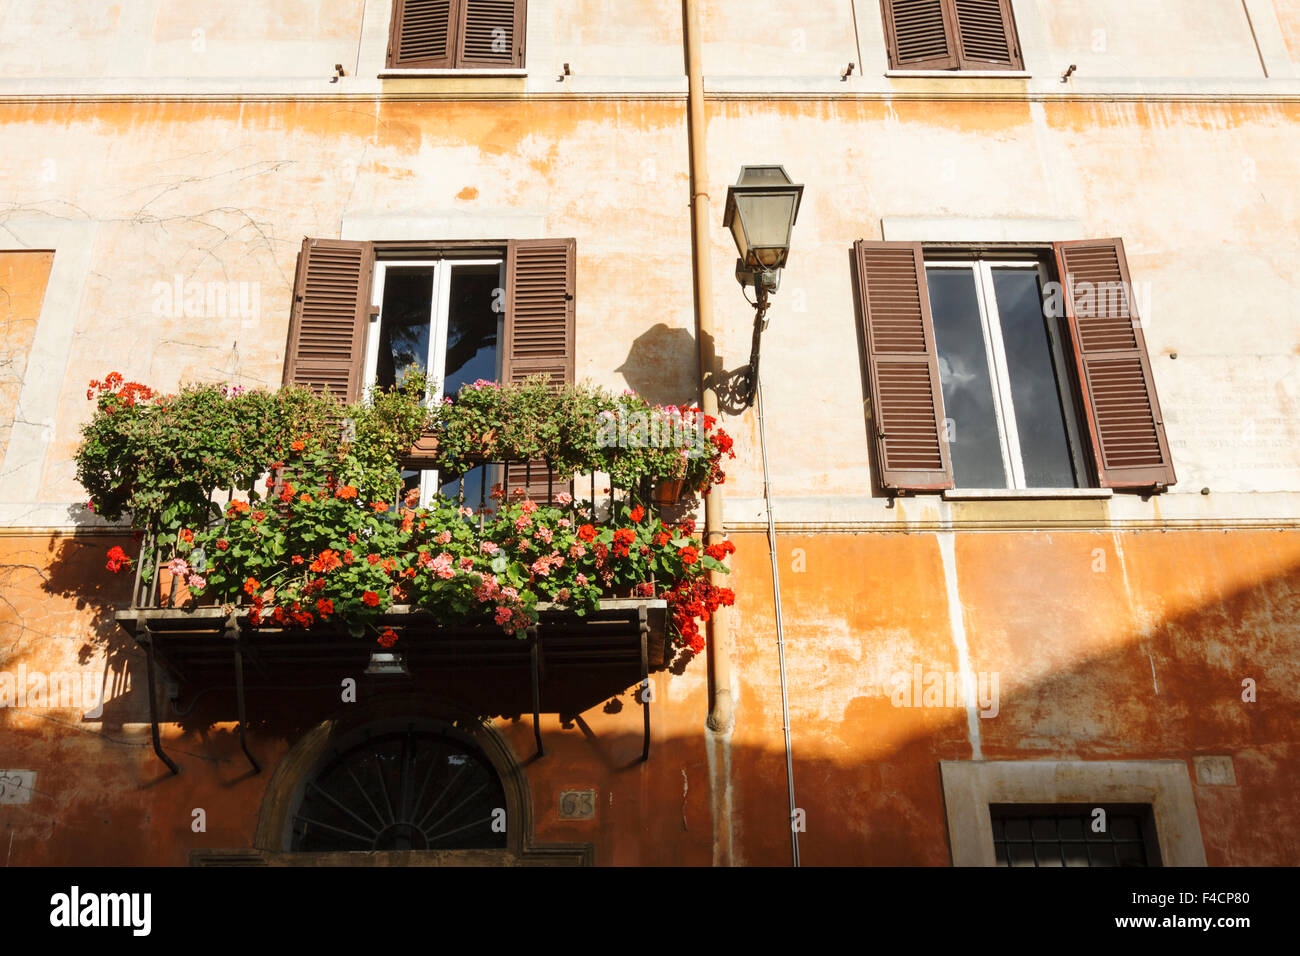 Ochre walls in warm tones characterize the roman urban landscape. Via Giulia, Rome, Italy - Stock Image